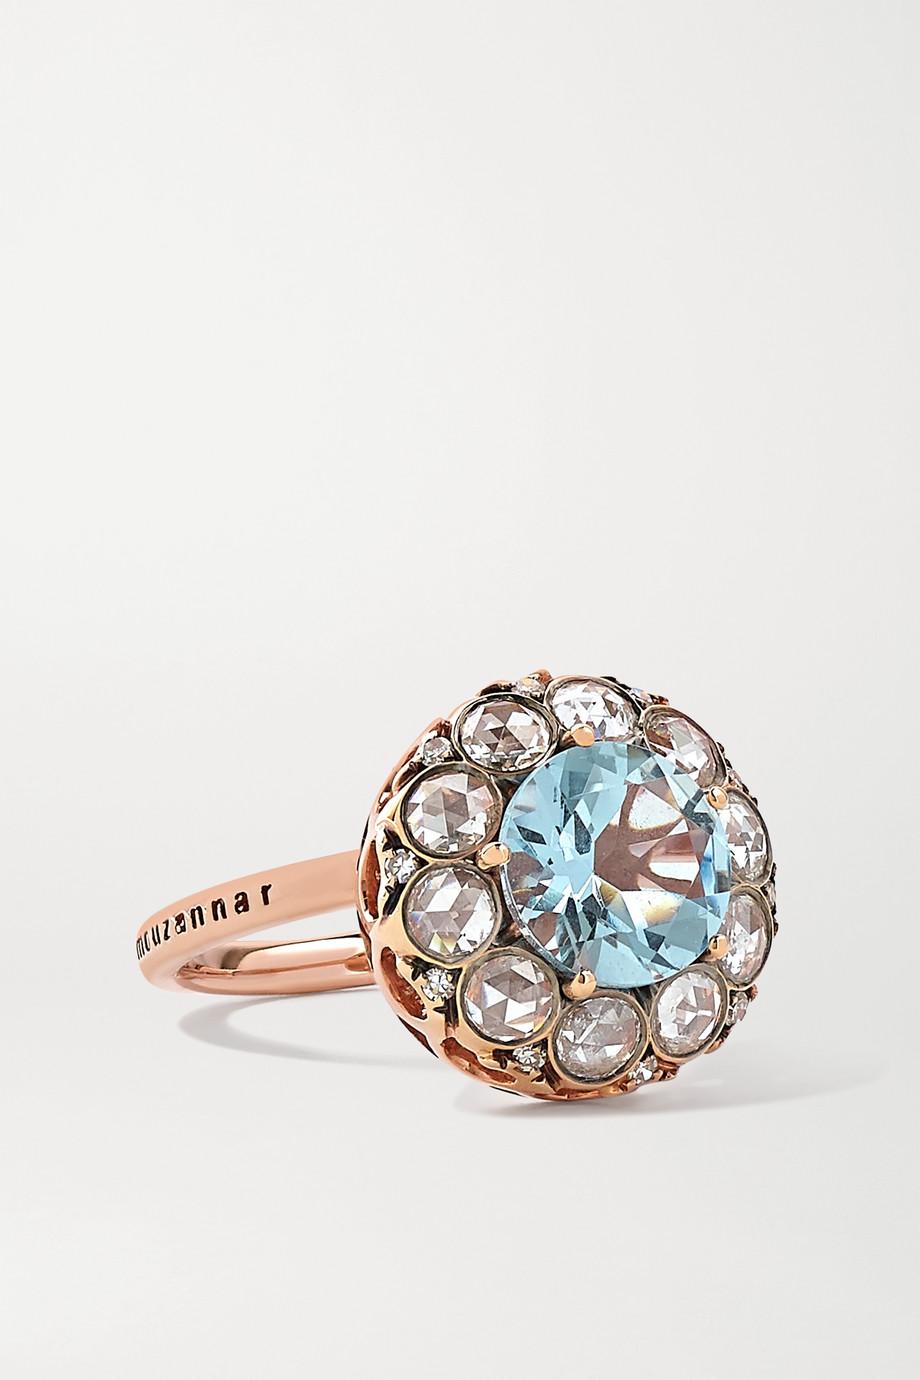 Selim Mouzannar Beirut Ring aus 18 Karat Roségold mit Aquamarin und Diamanten